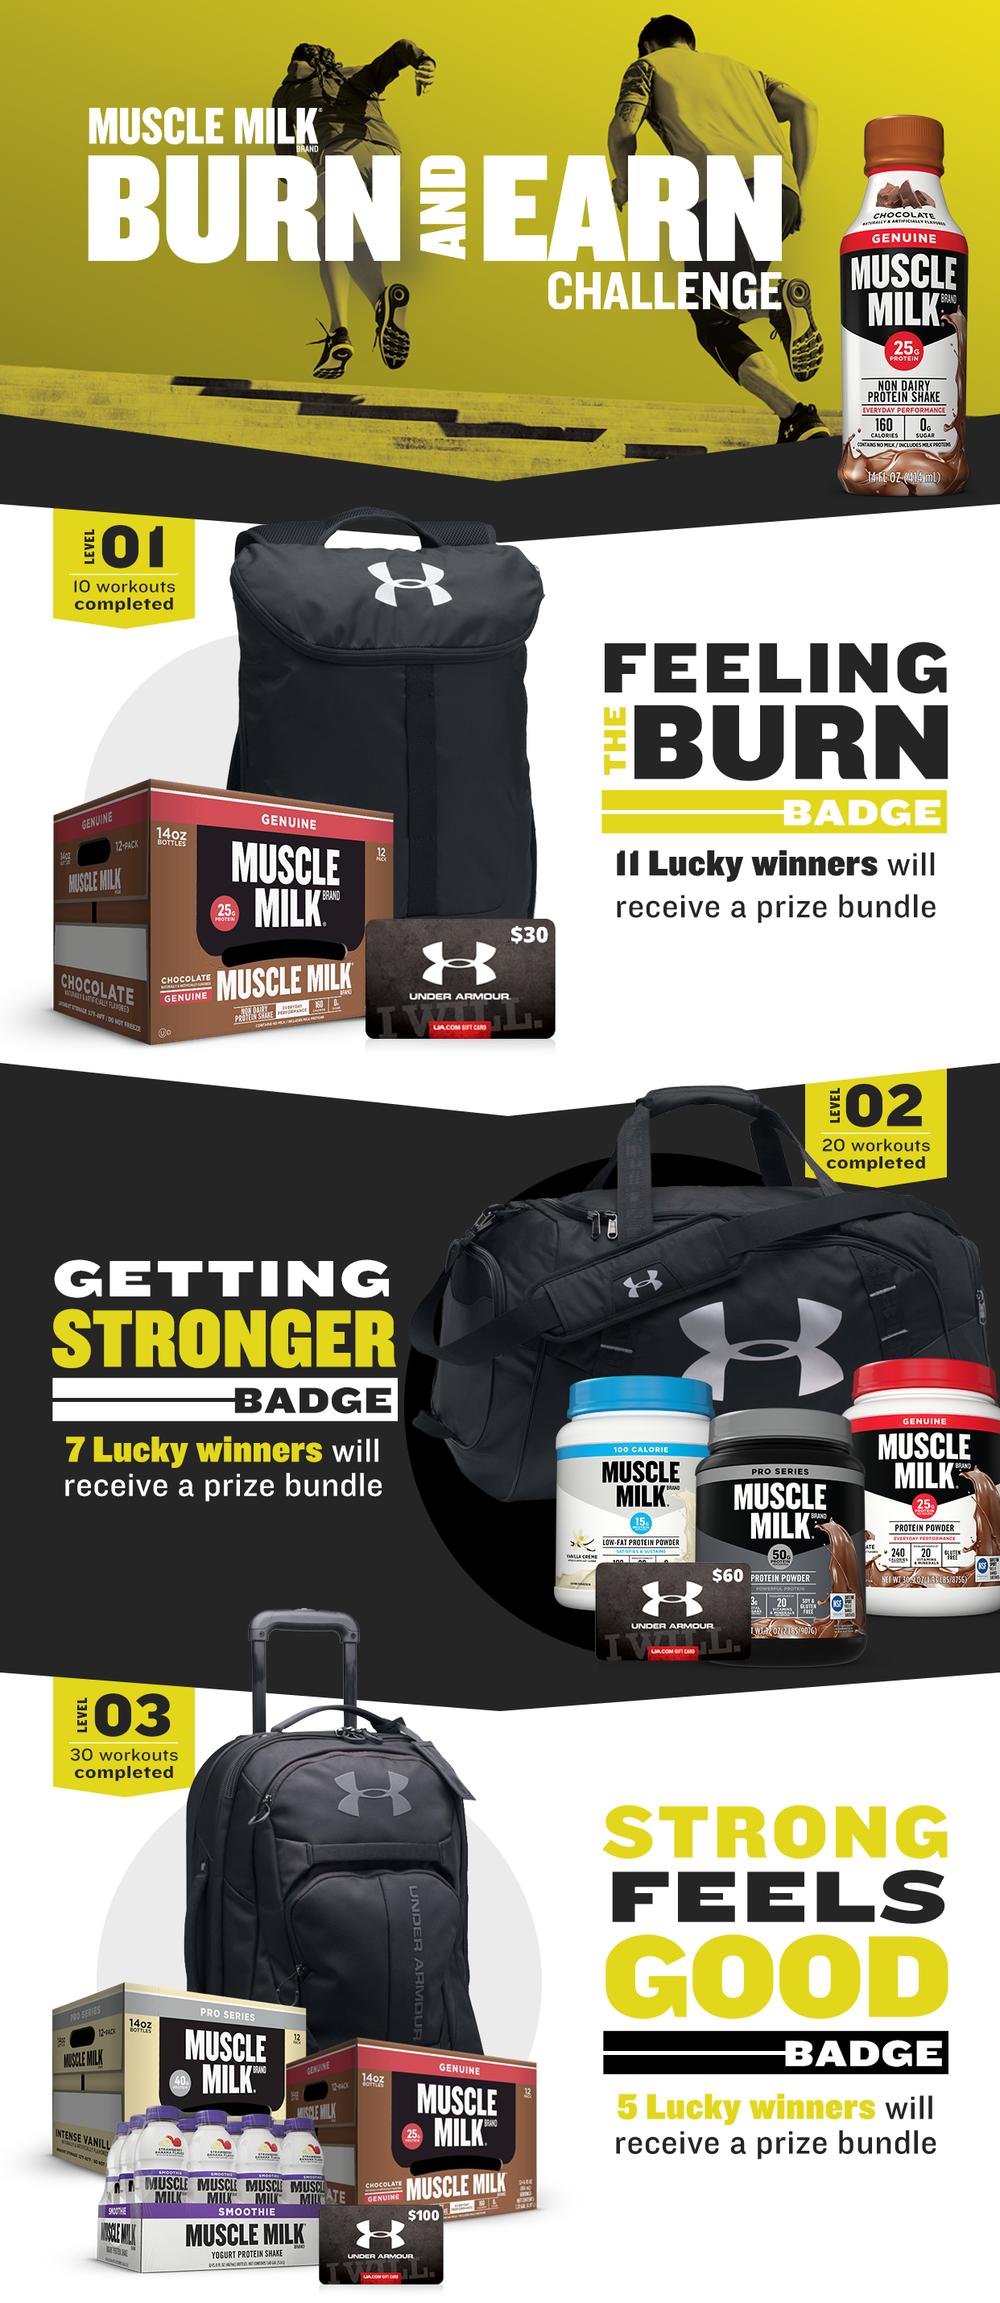 MuscleMilk_Burn-and-Earn_-Challenge_CustomTab_Example (acb19933-b9a3-4fe2-b2b8-52caab0a7767).png